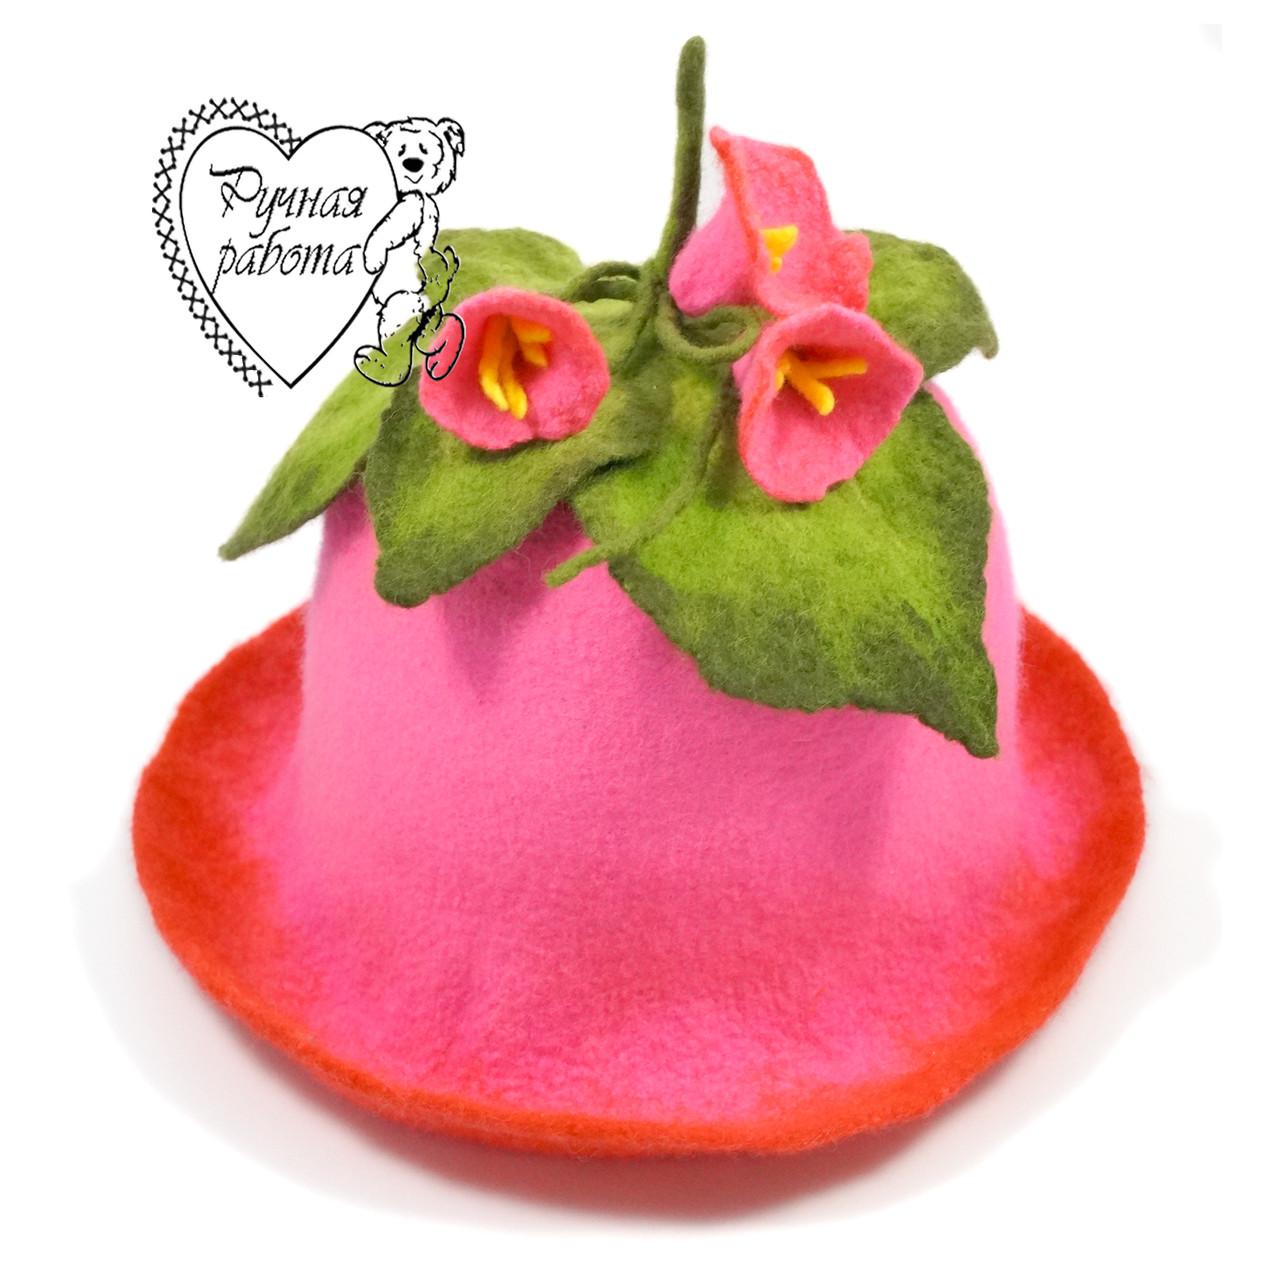 Банна шапка Дзвіночок квітка, жіноча, натуральна шерсть, ручна робота